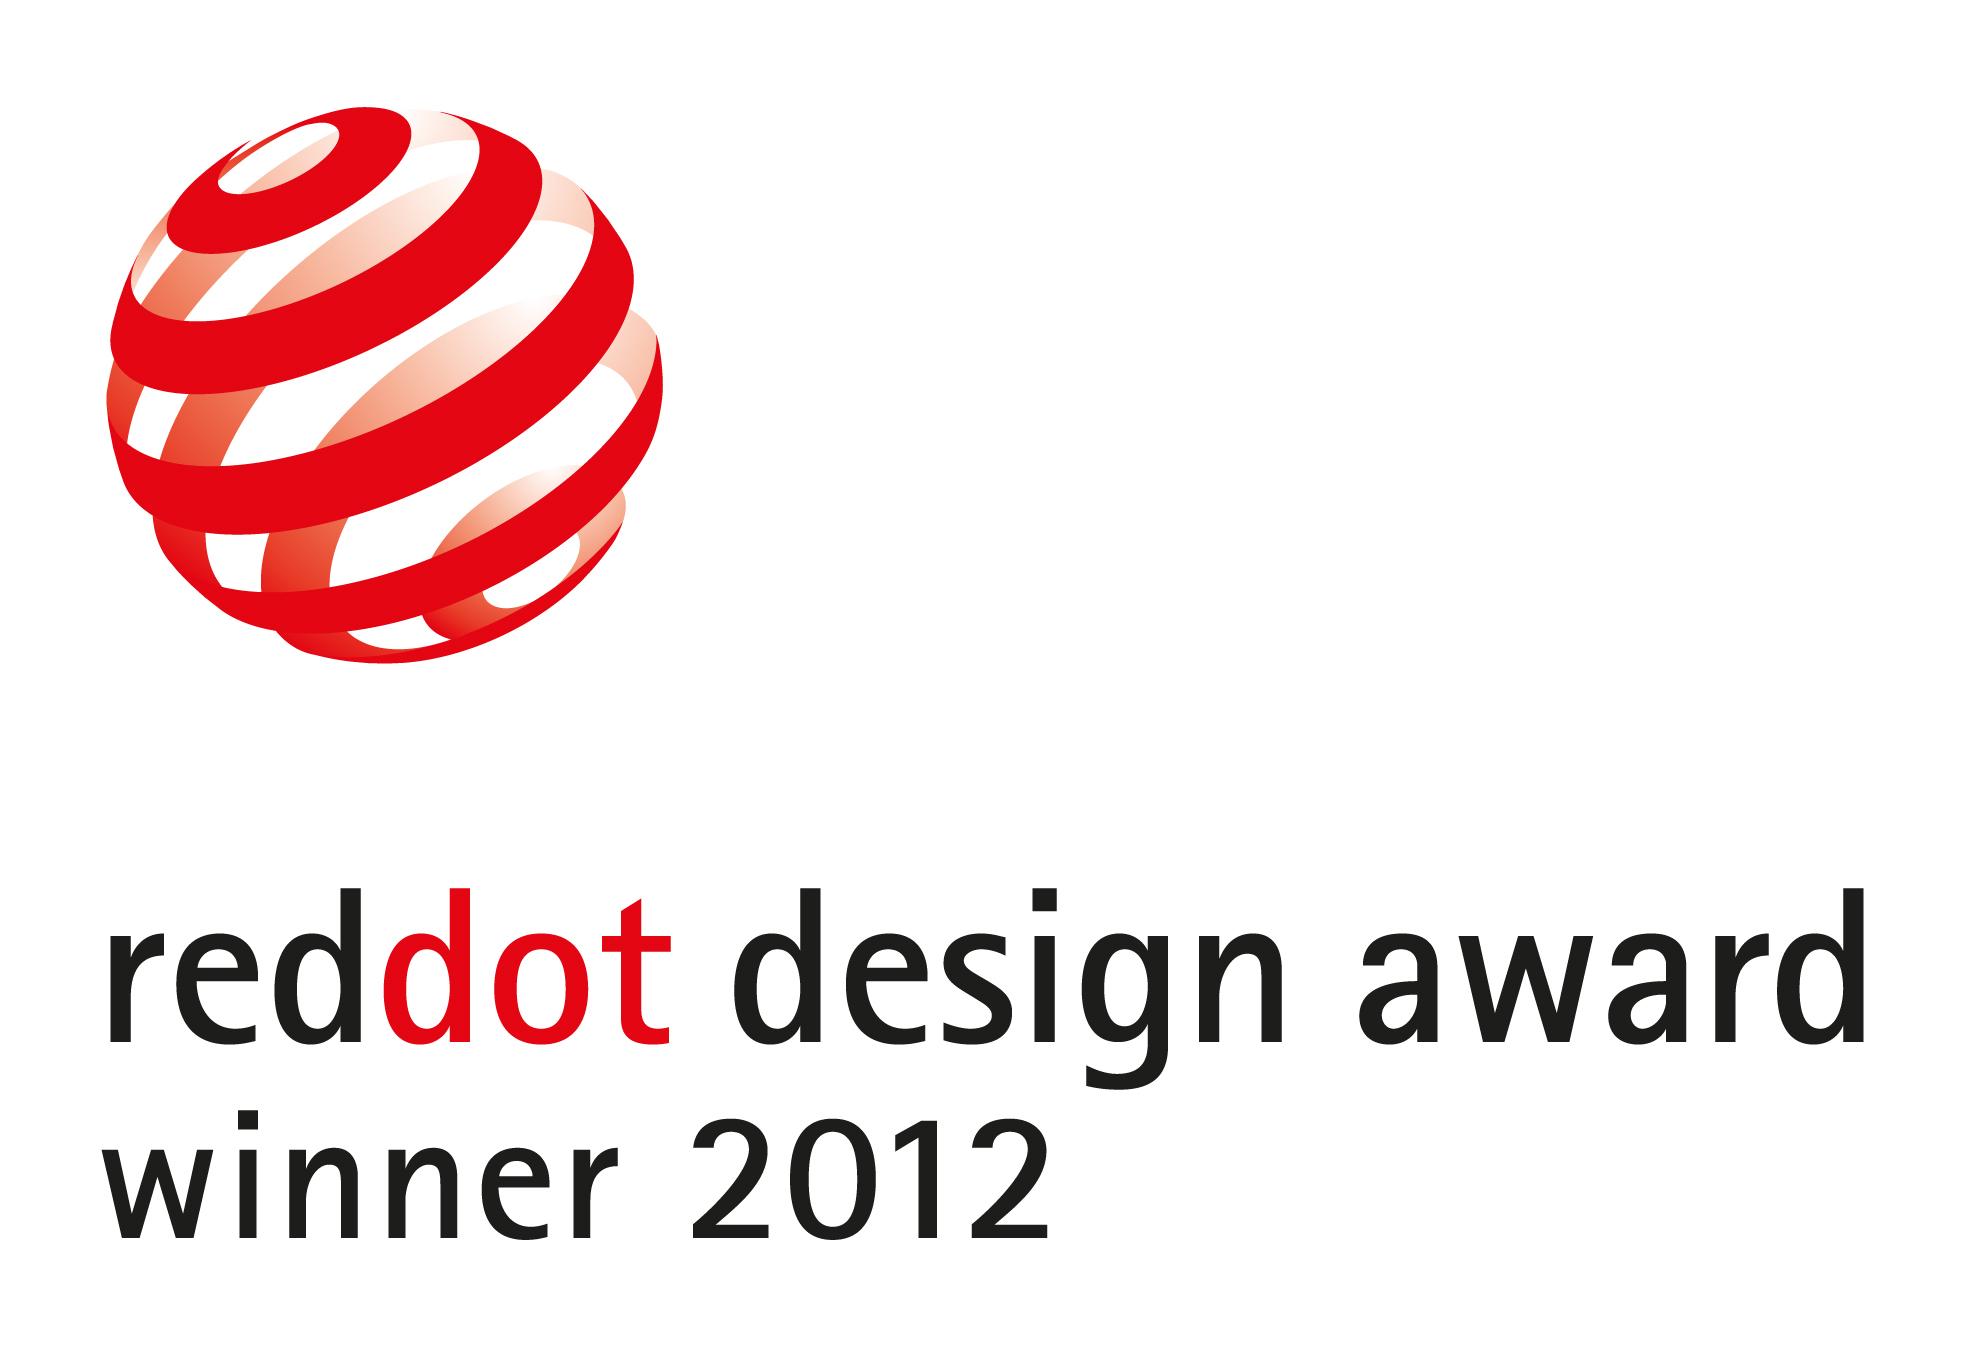 ال جي موفق به كسب جوايز طراحي  Red Dot و  IF Design گرديد